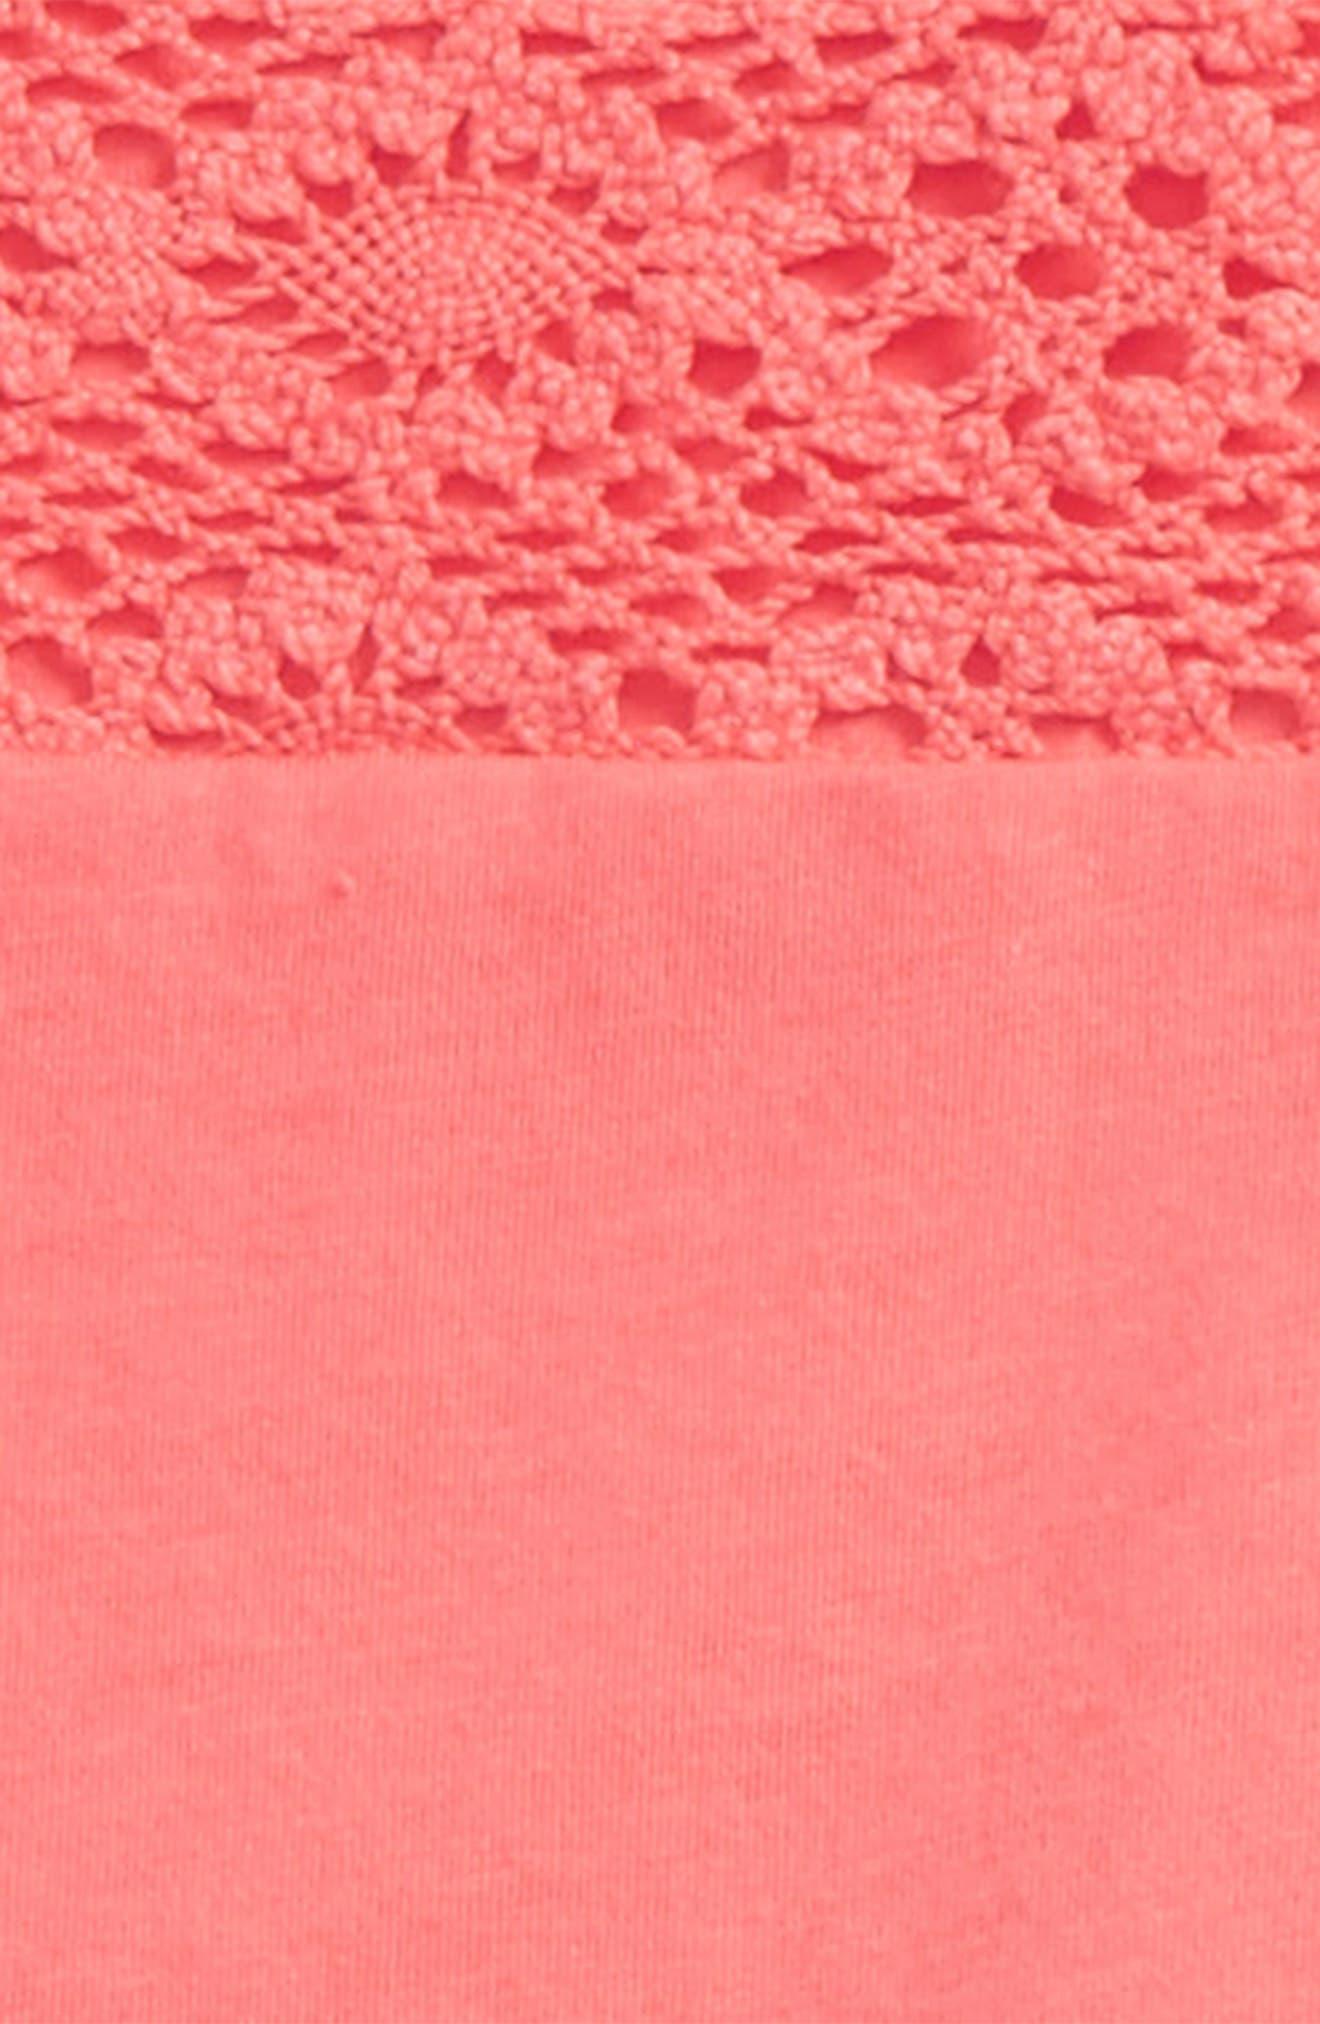 Burt's Bees Kids Crochet Yoke Organic Cotton Tee & Flower Print Leggings Set,                             Alternate thumbnail 2, color,                             957